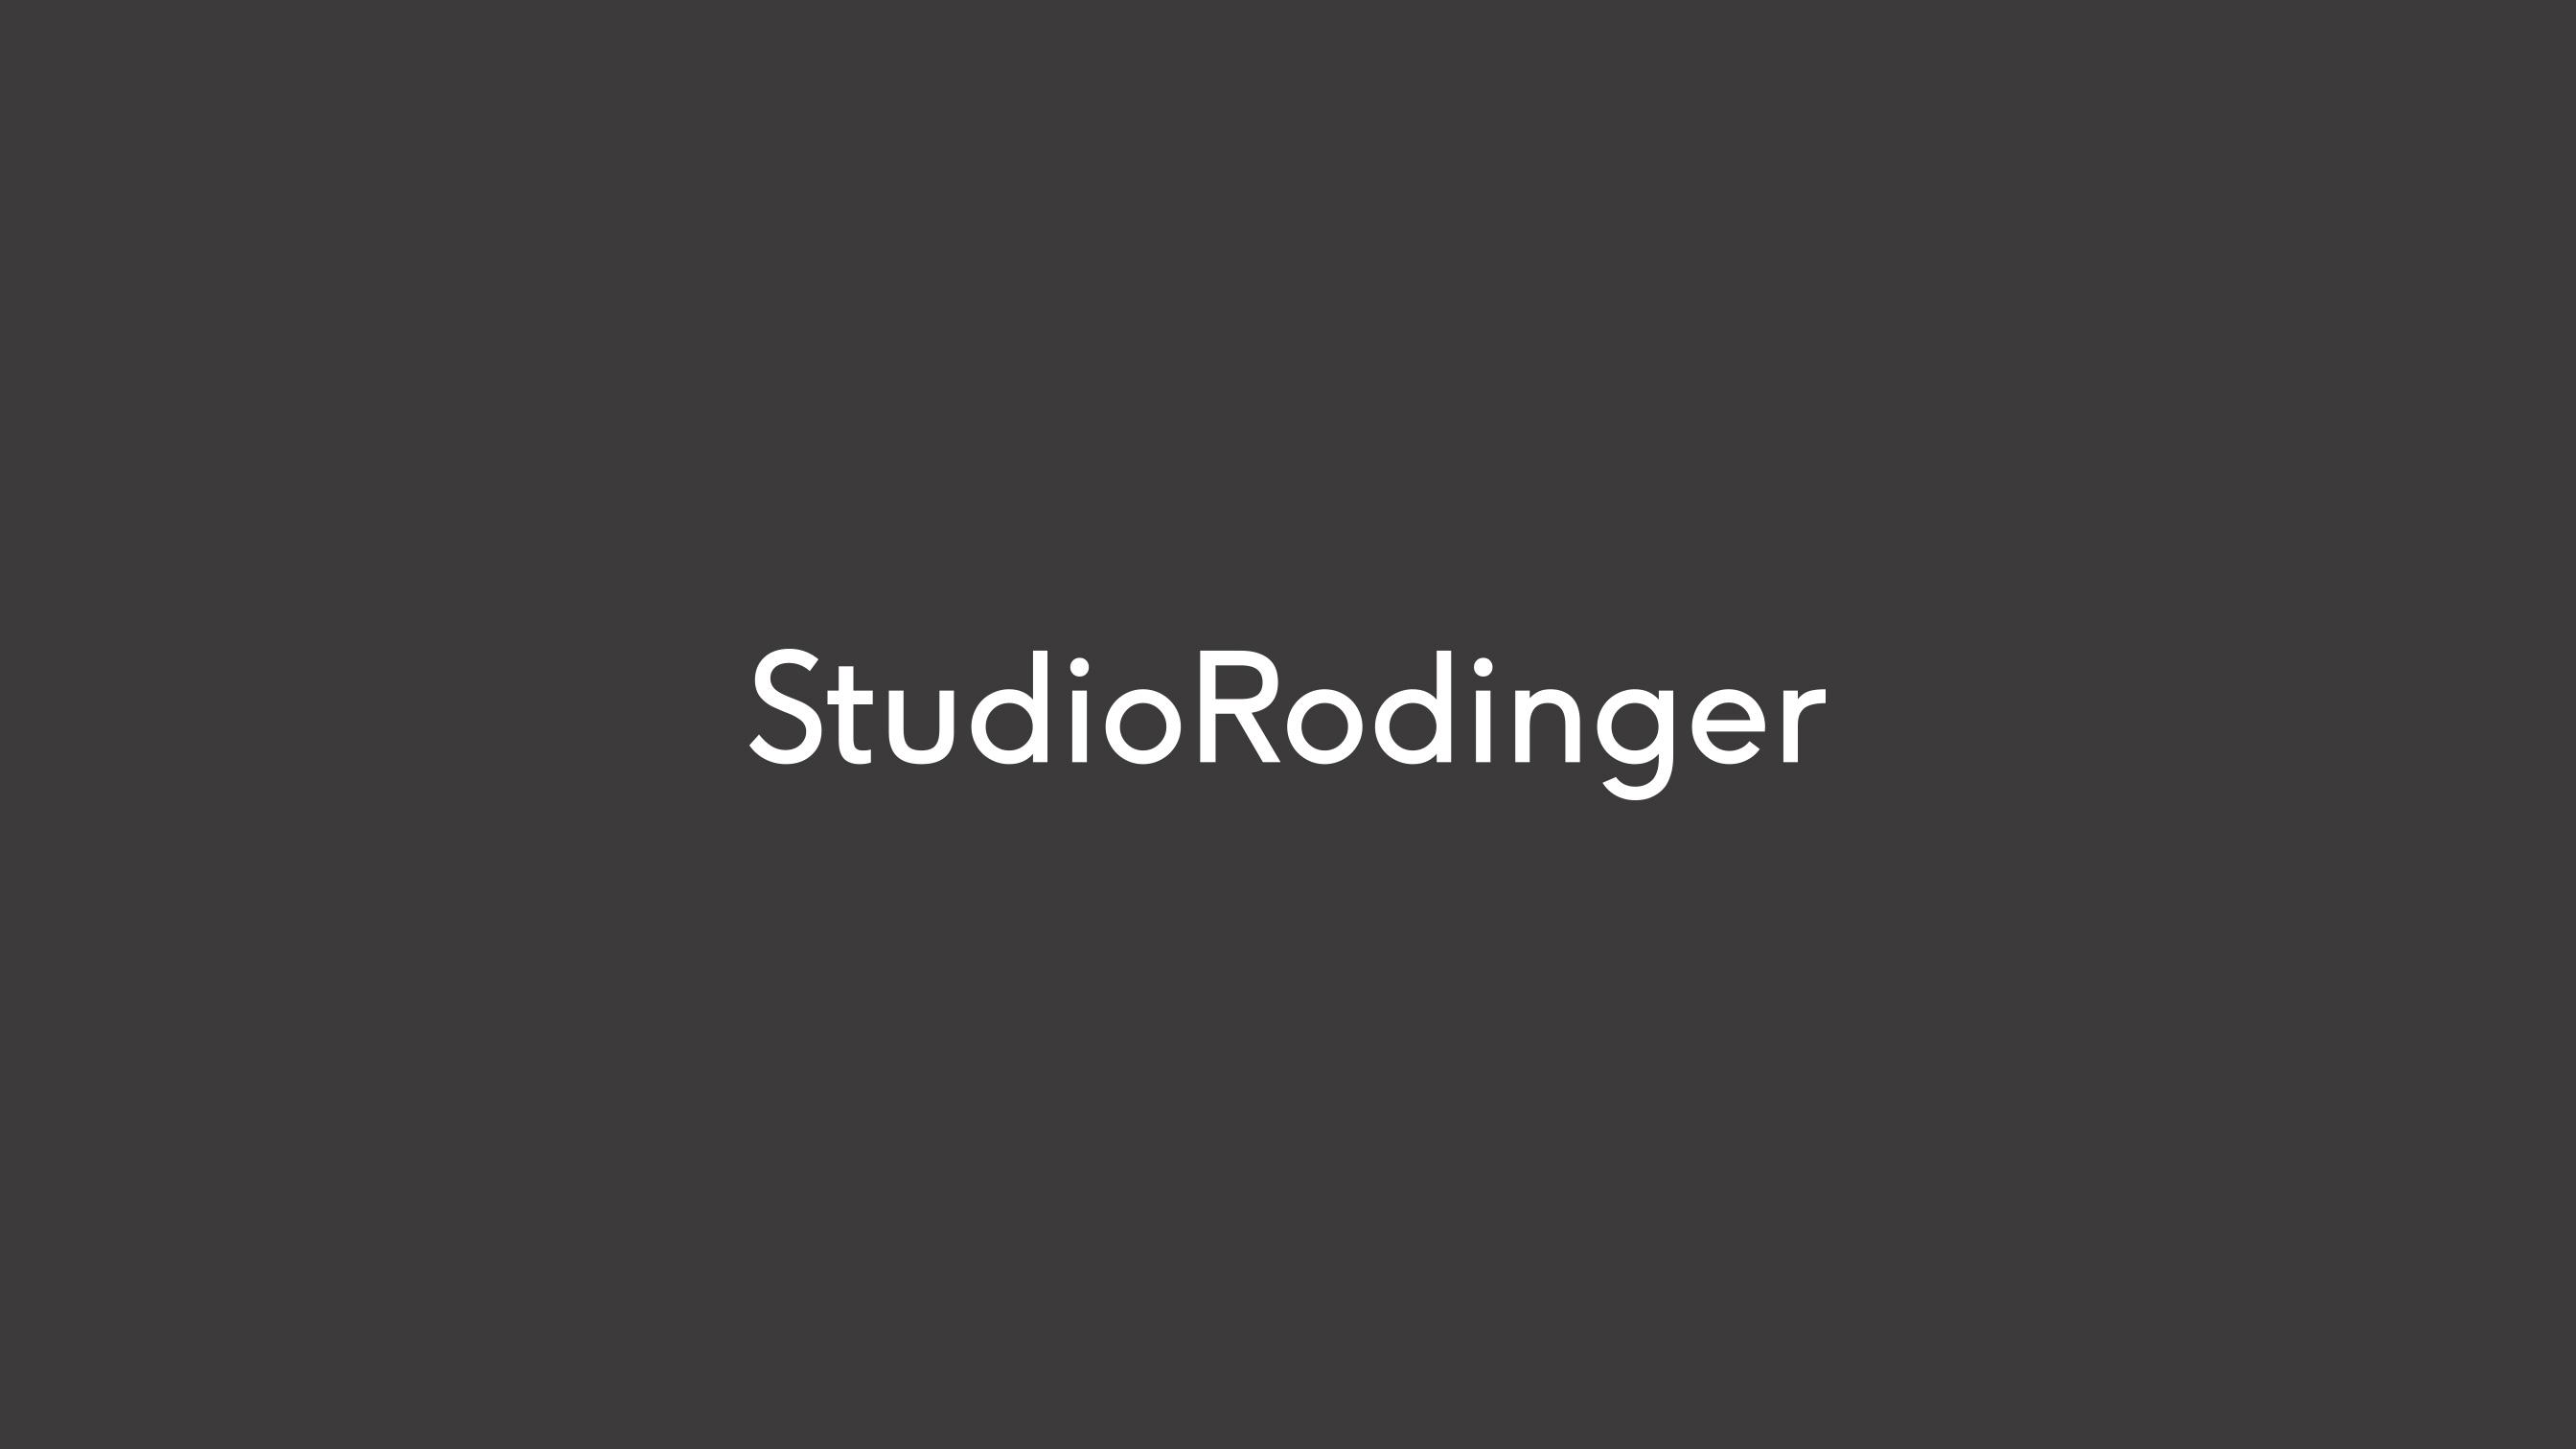 01-studio-rodinger-pikteo-webdesign-graphic-design-freelance-paris-bruxelles-londres